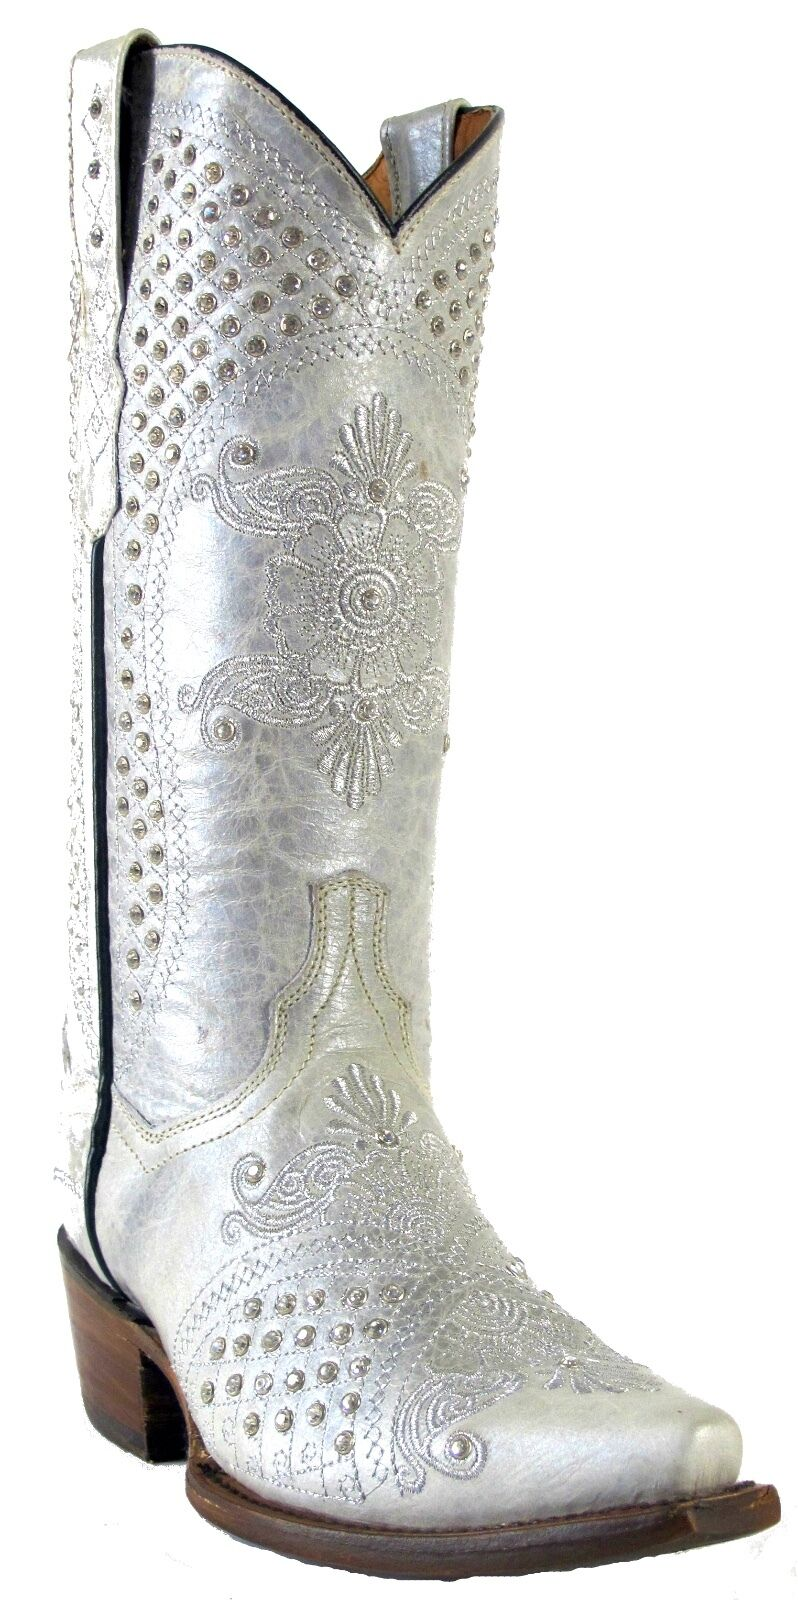 Botines  y abotinados -  Botines Sendra botas Blanco Mujer Serraje 15107 2262047 97af87